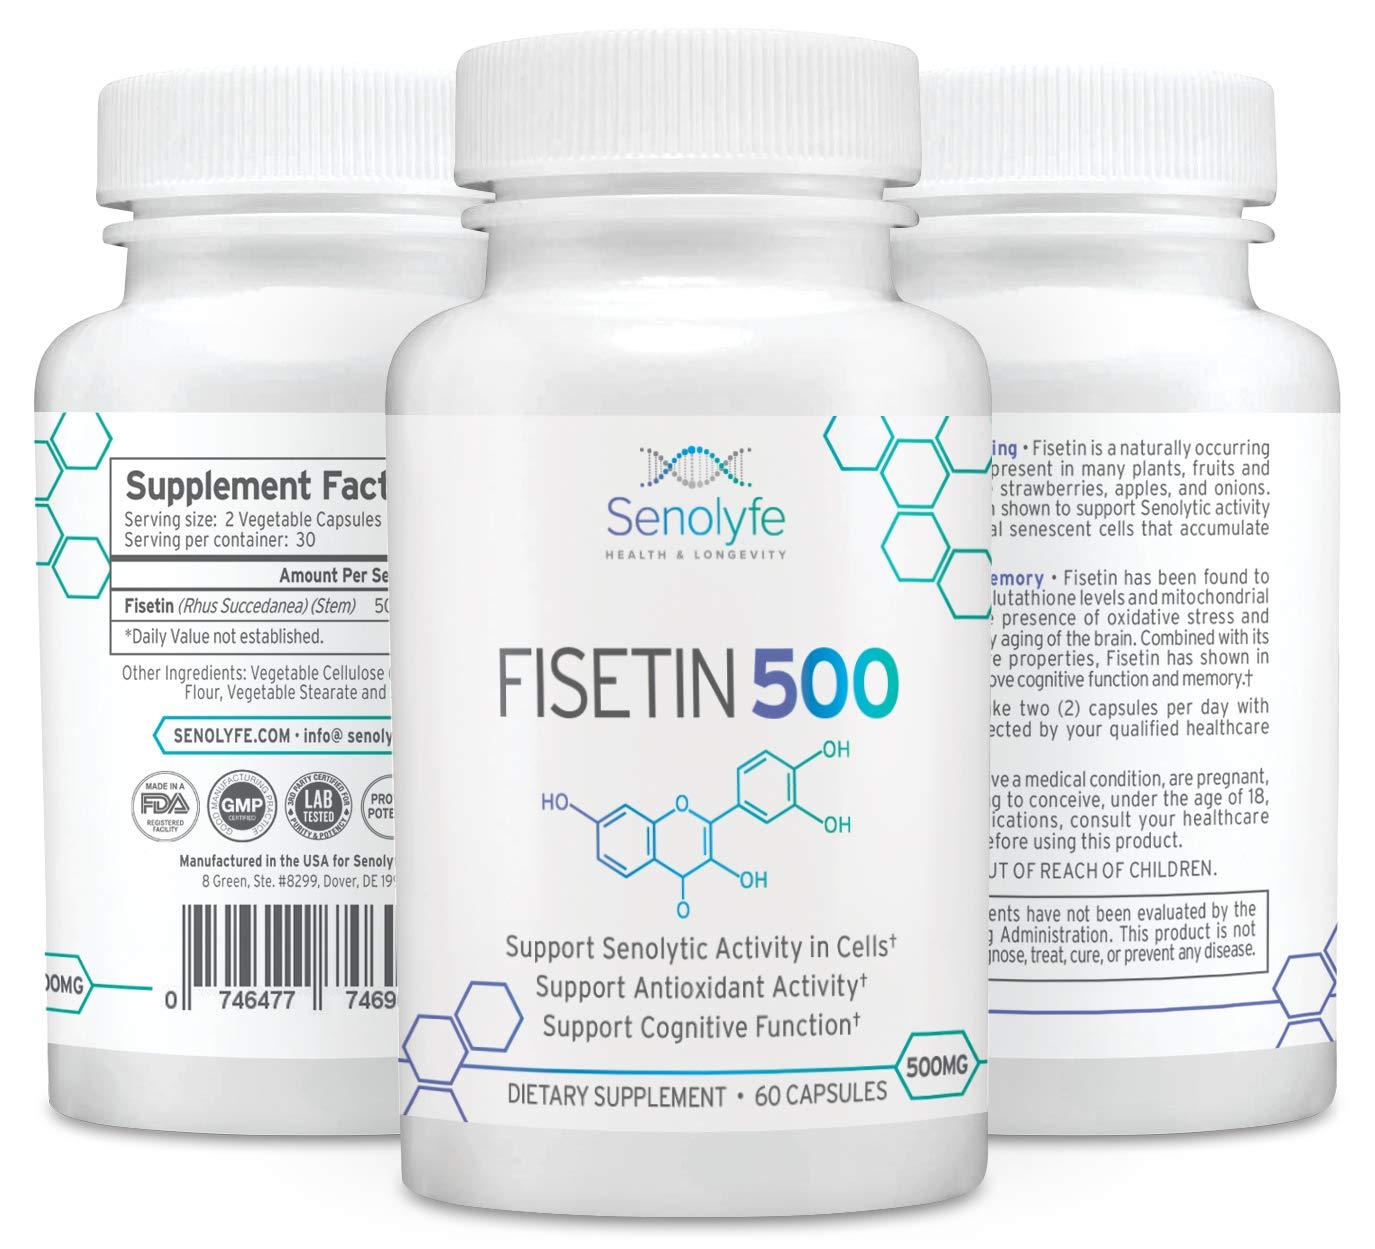 Fisetin 500 | 500mg 98% Pure Fisetin - Natural Senolytic Compound & Longevity Support by Senolyfe